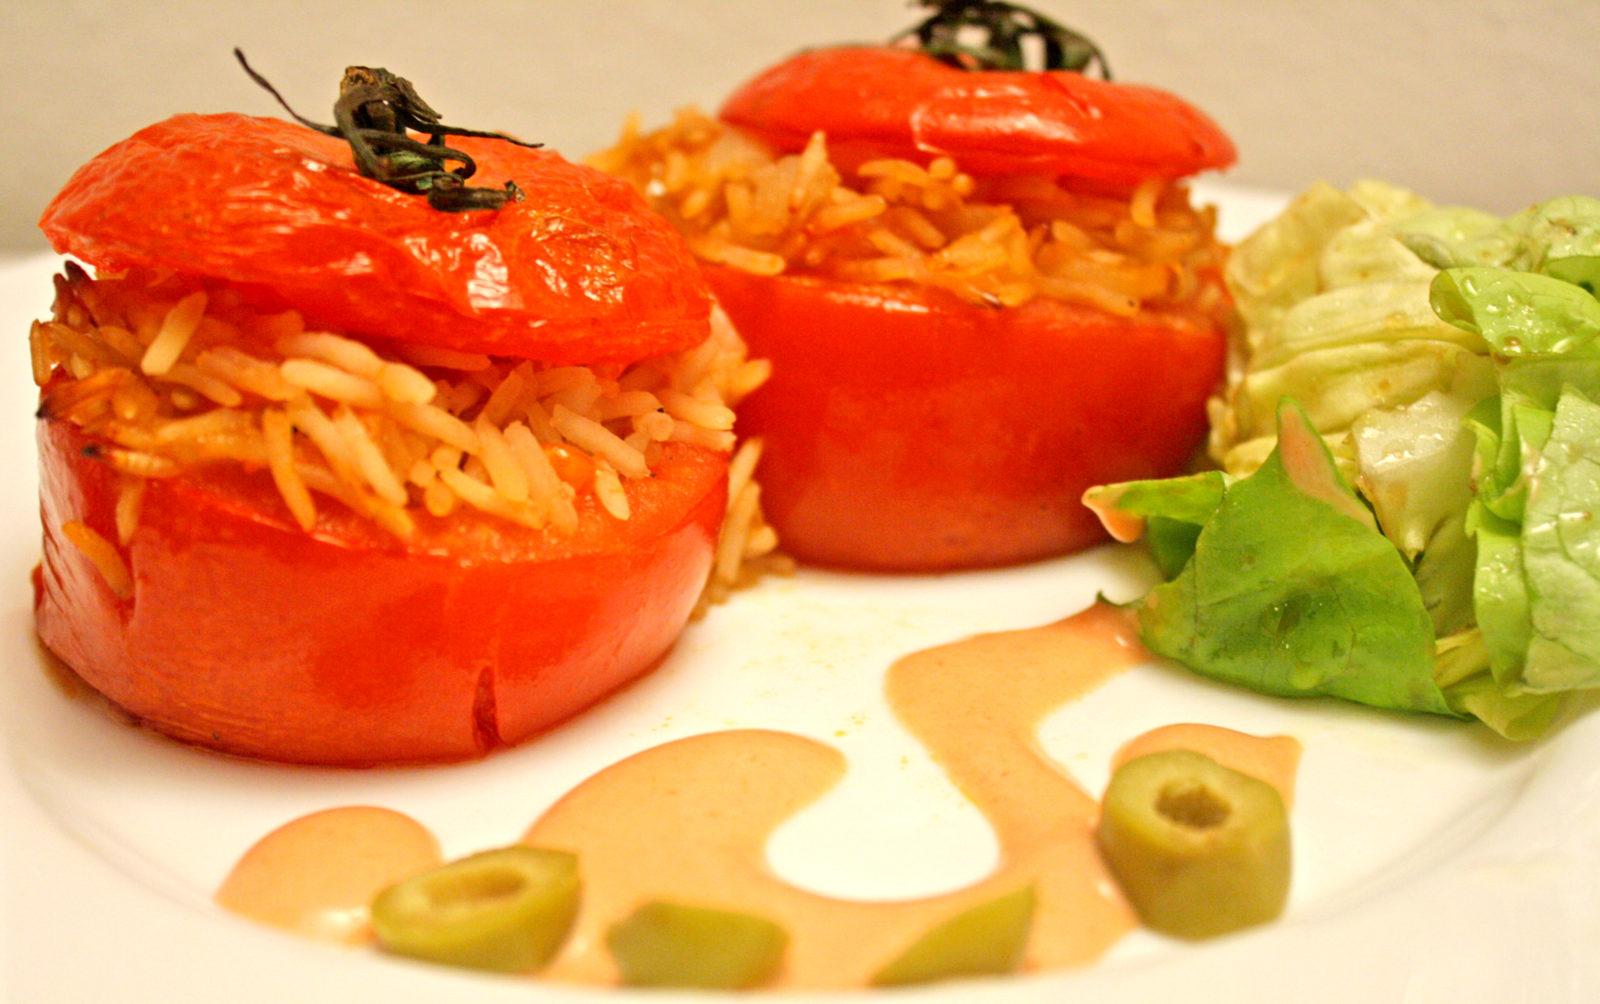 Tomates rellenos de arroz basmati